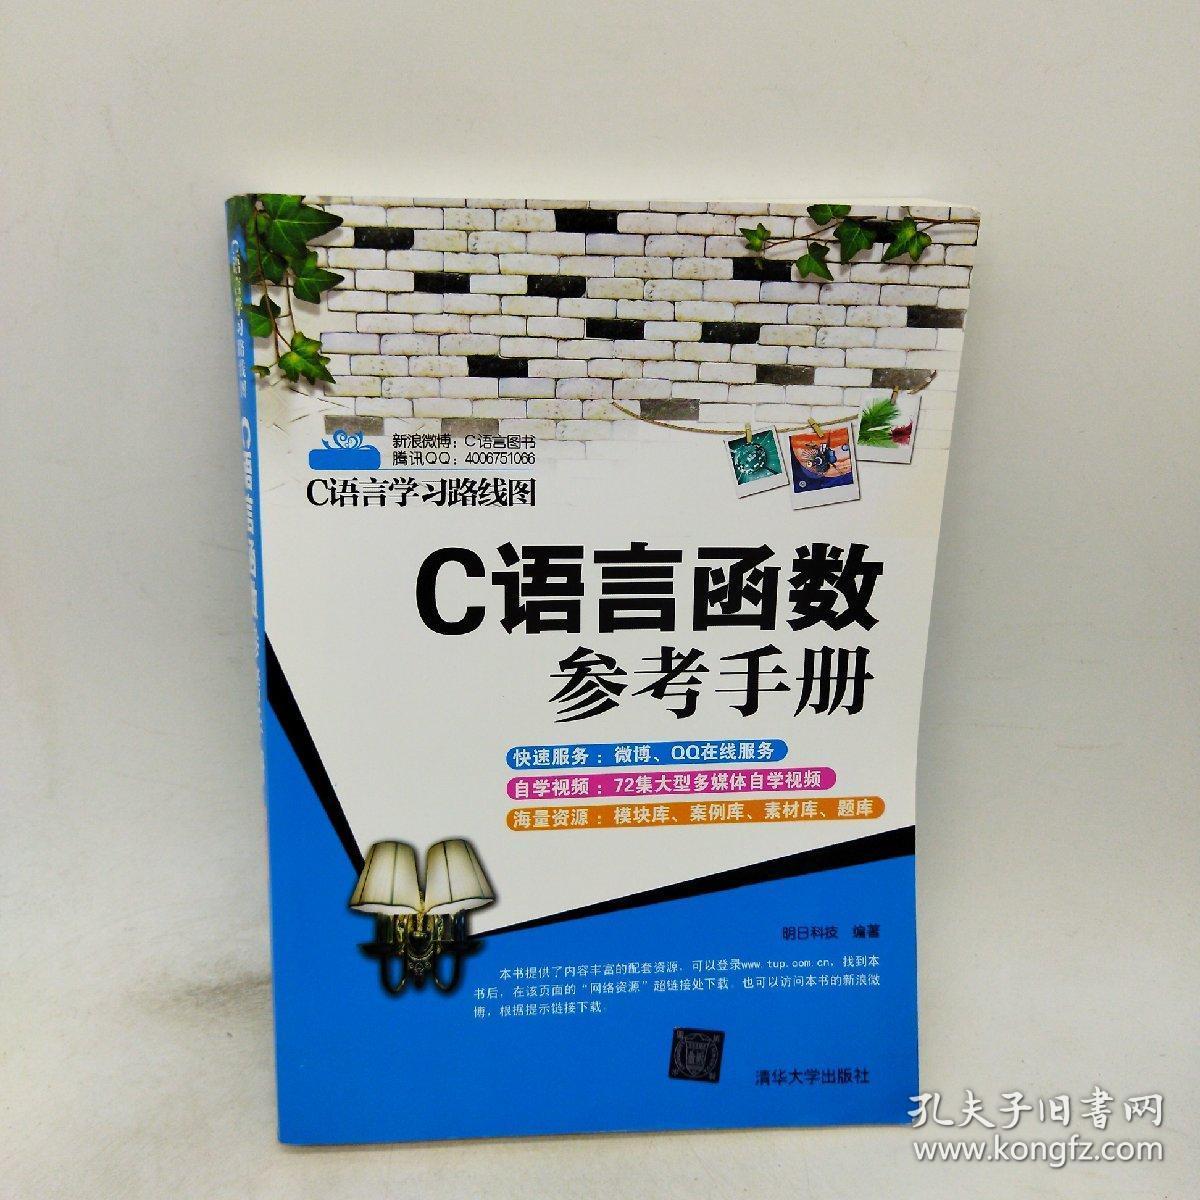 C语言学习路线图:C语言函数参考手册